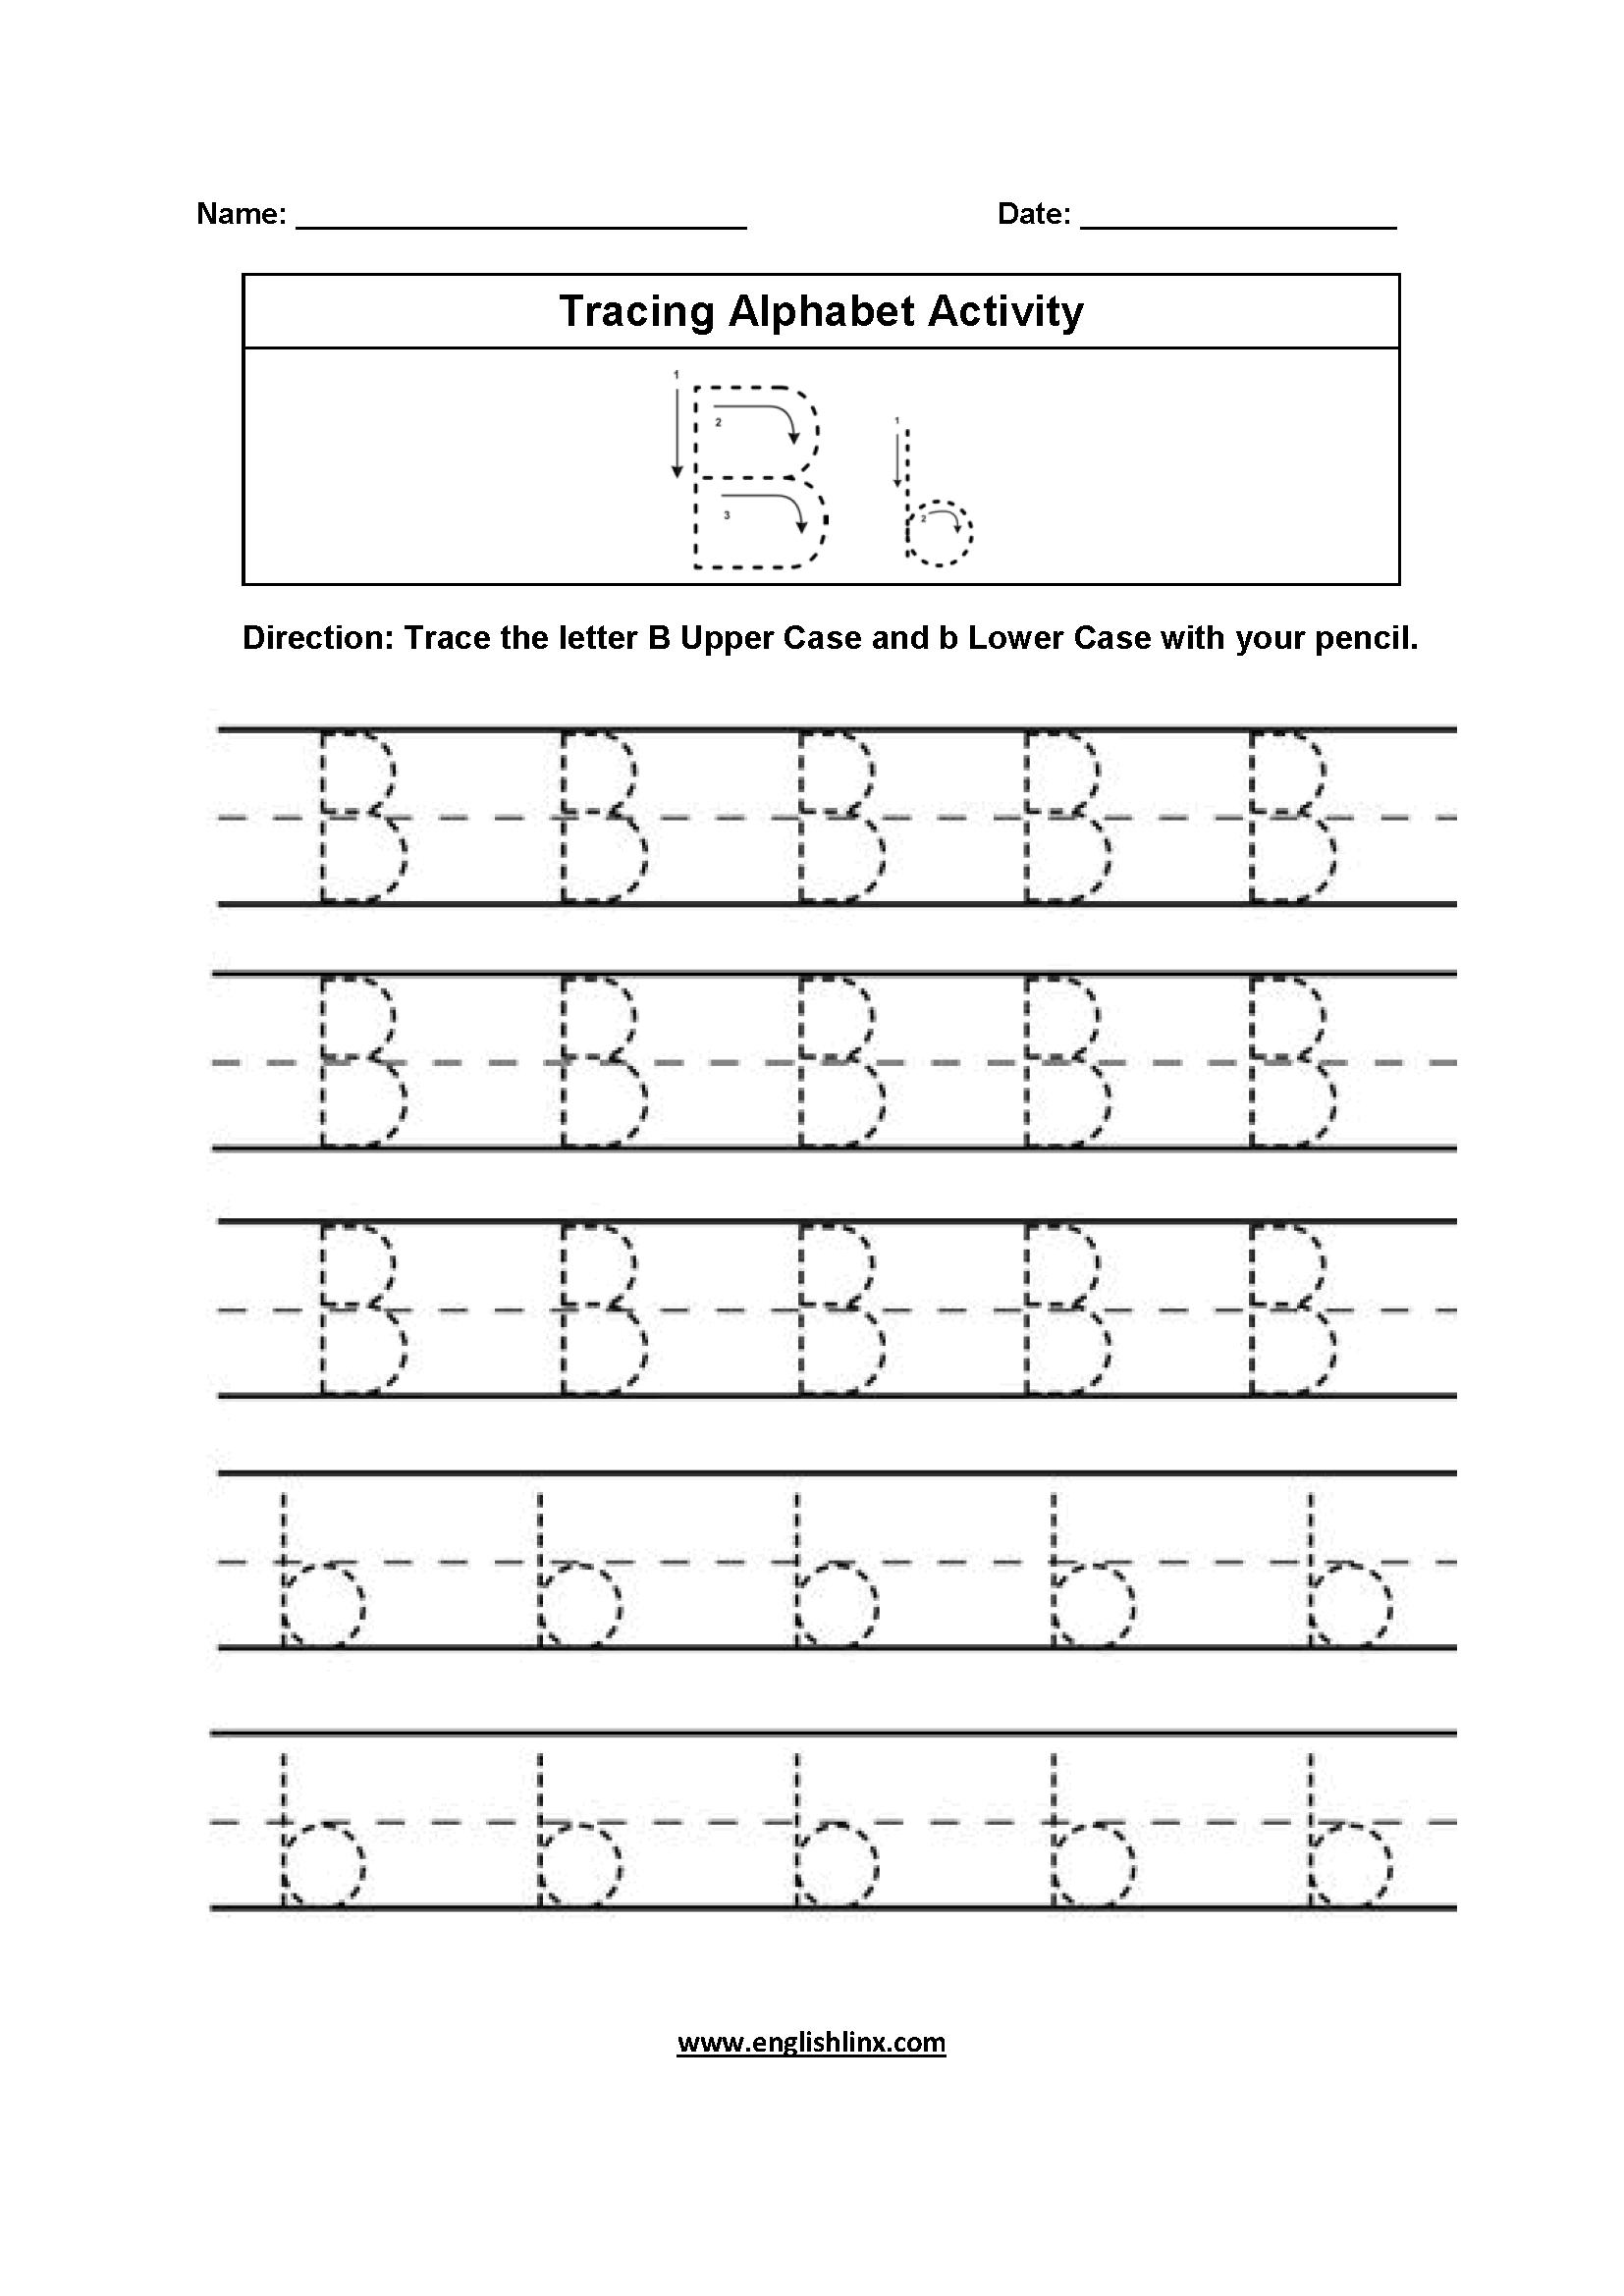 Alphabet Worksheets | Tracing Alphabet Worksheets for Tracing Alphabet Letters Az